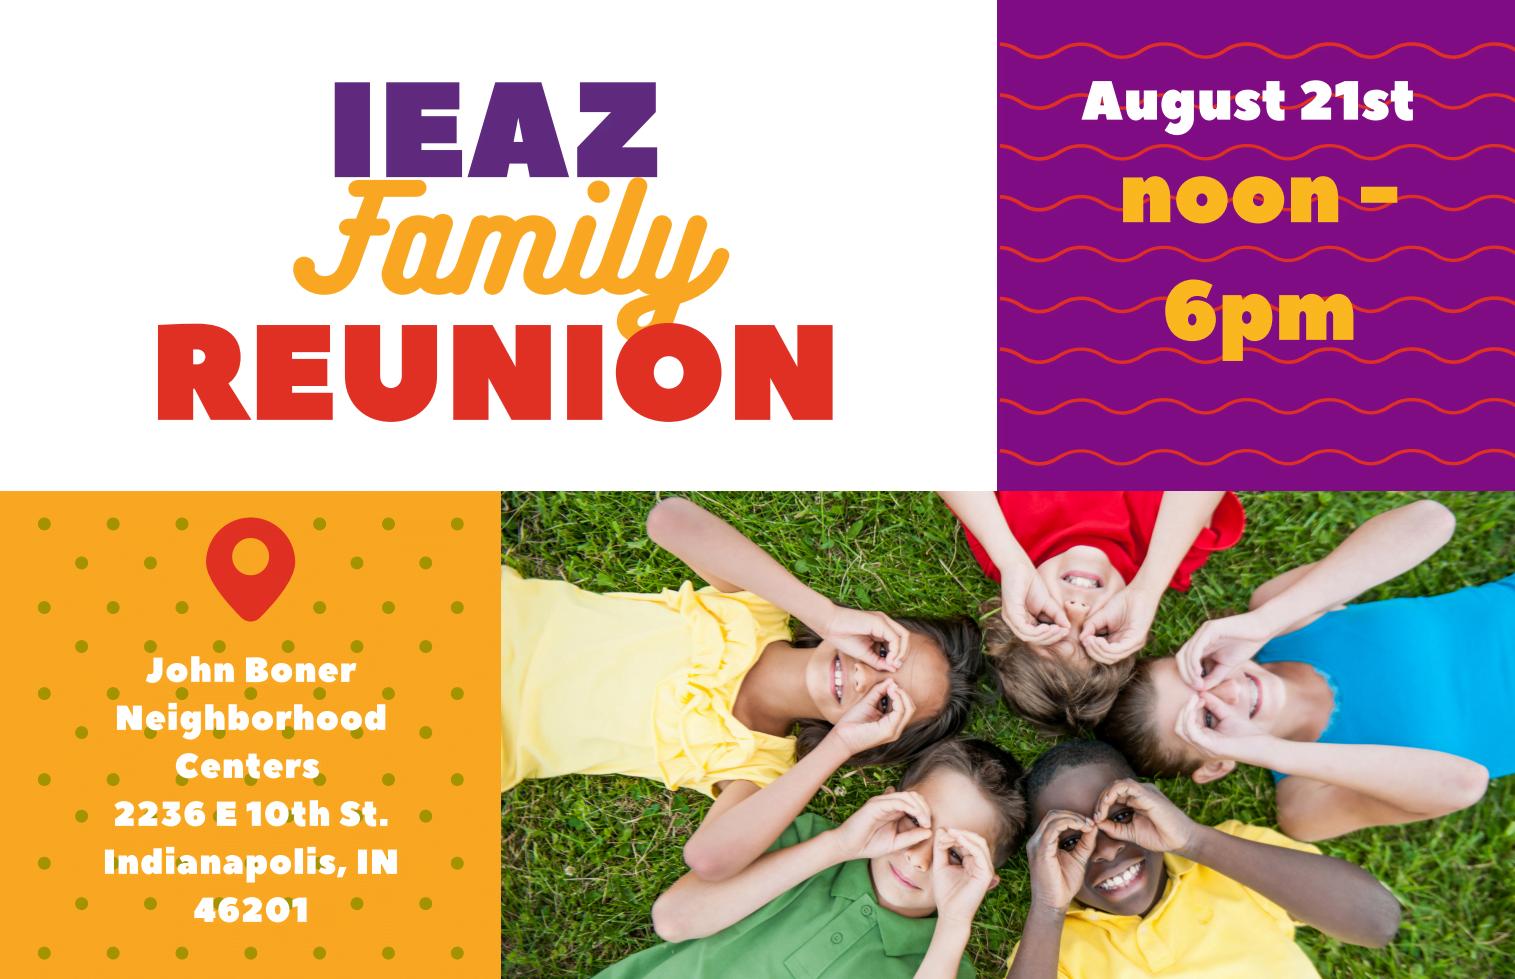 IEAZ Family Reunion